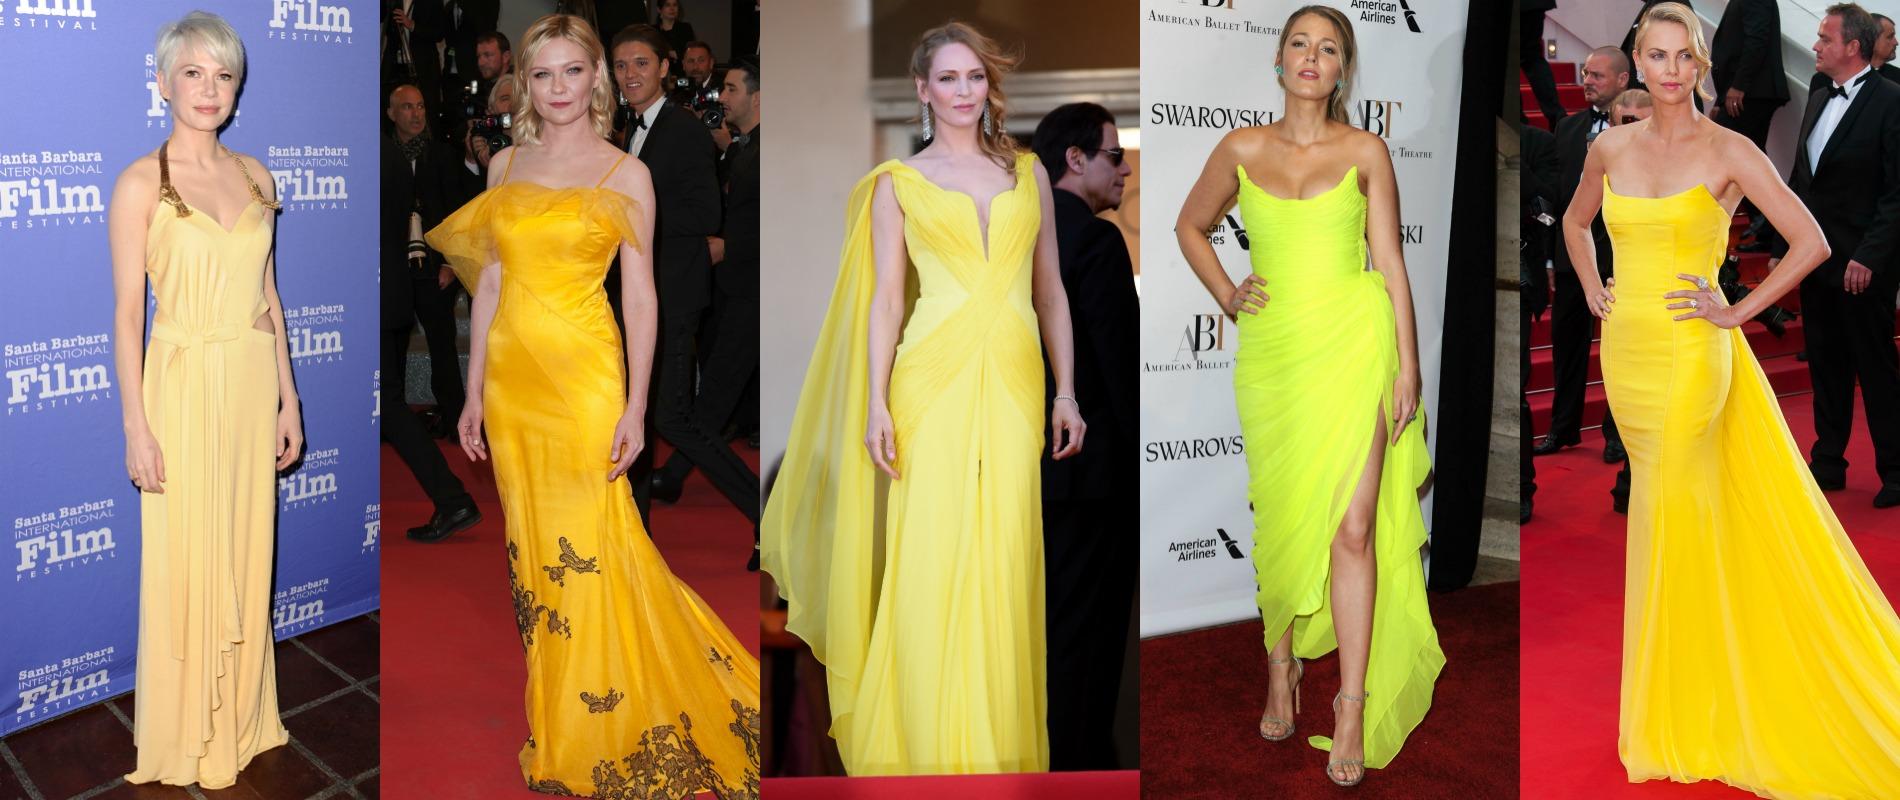 Comment oser le jaune quand on est blonde ? Madame Figaro